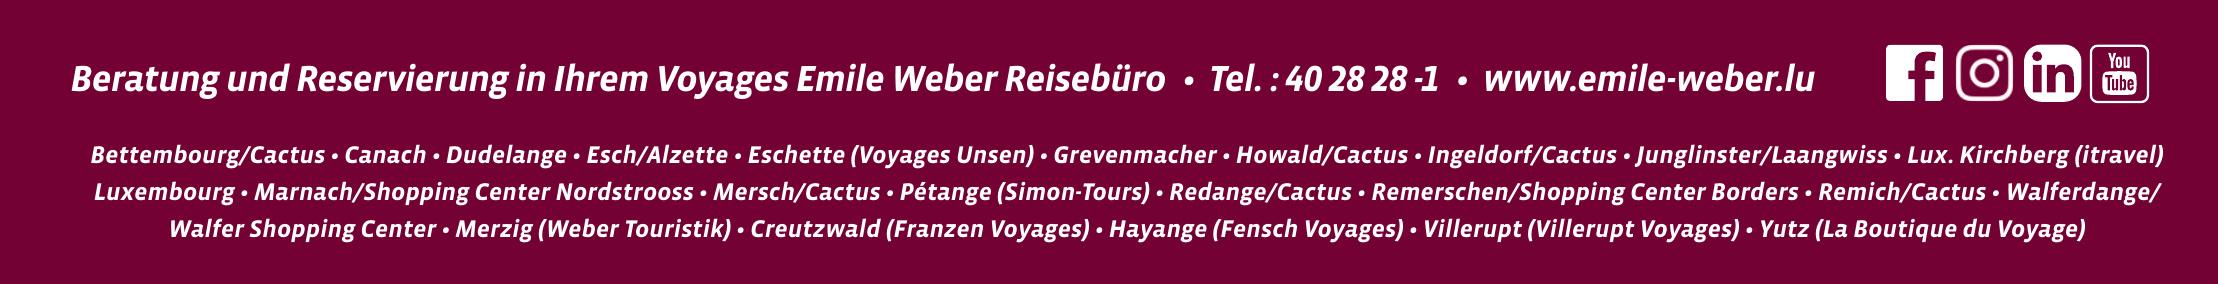 Voyages Emile Weber Reisebüro